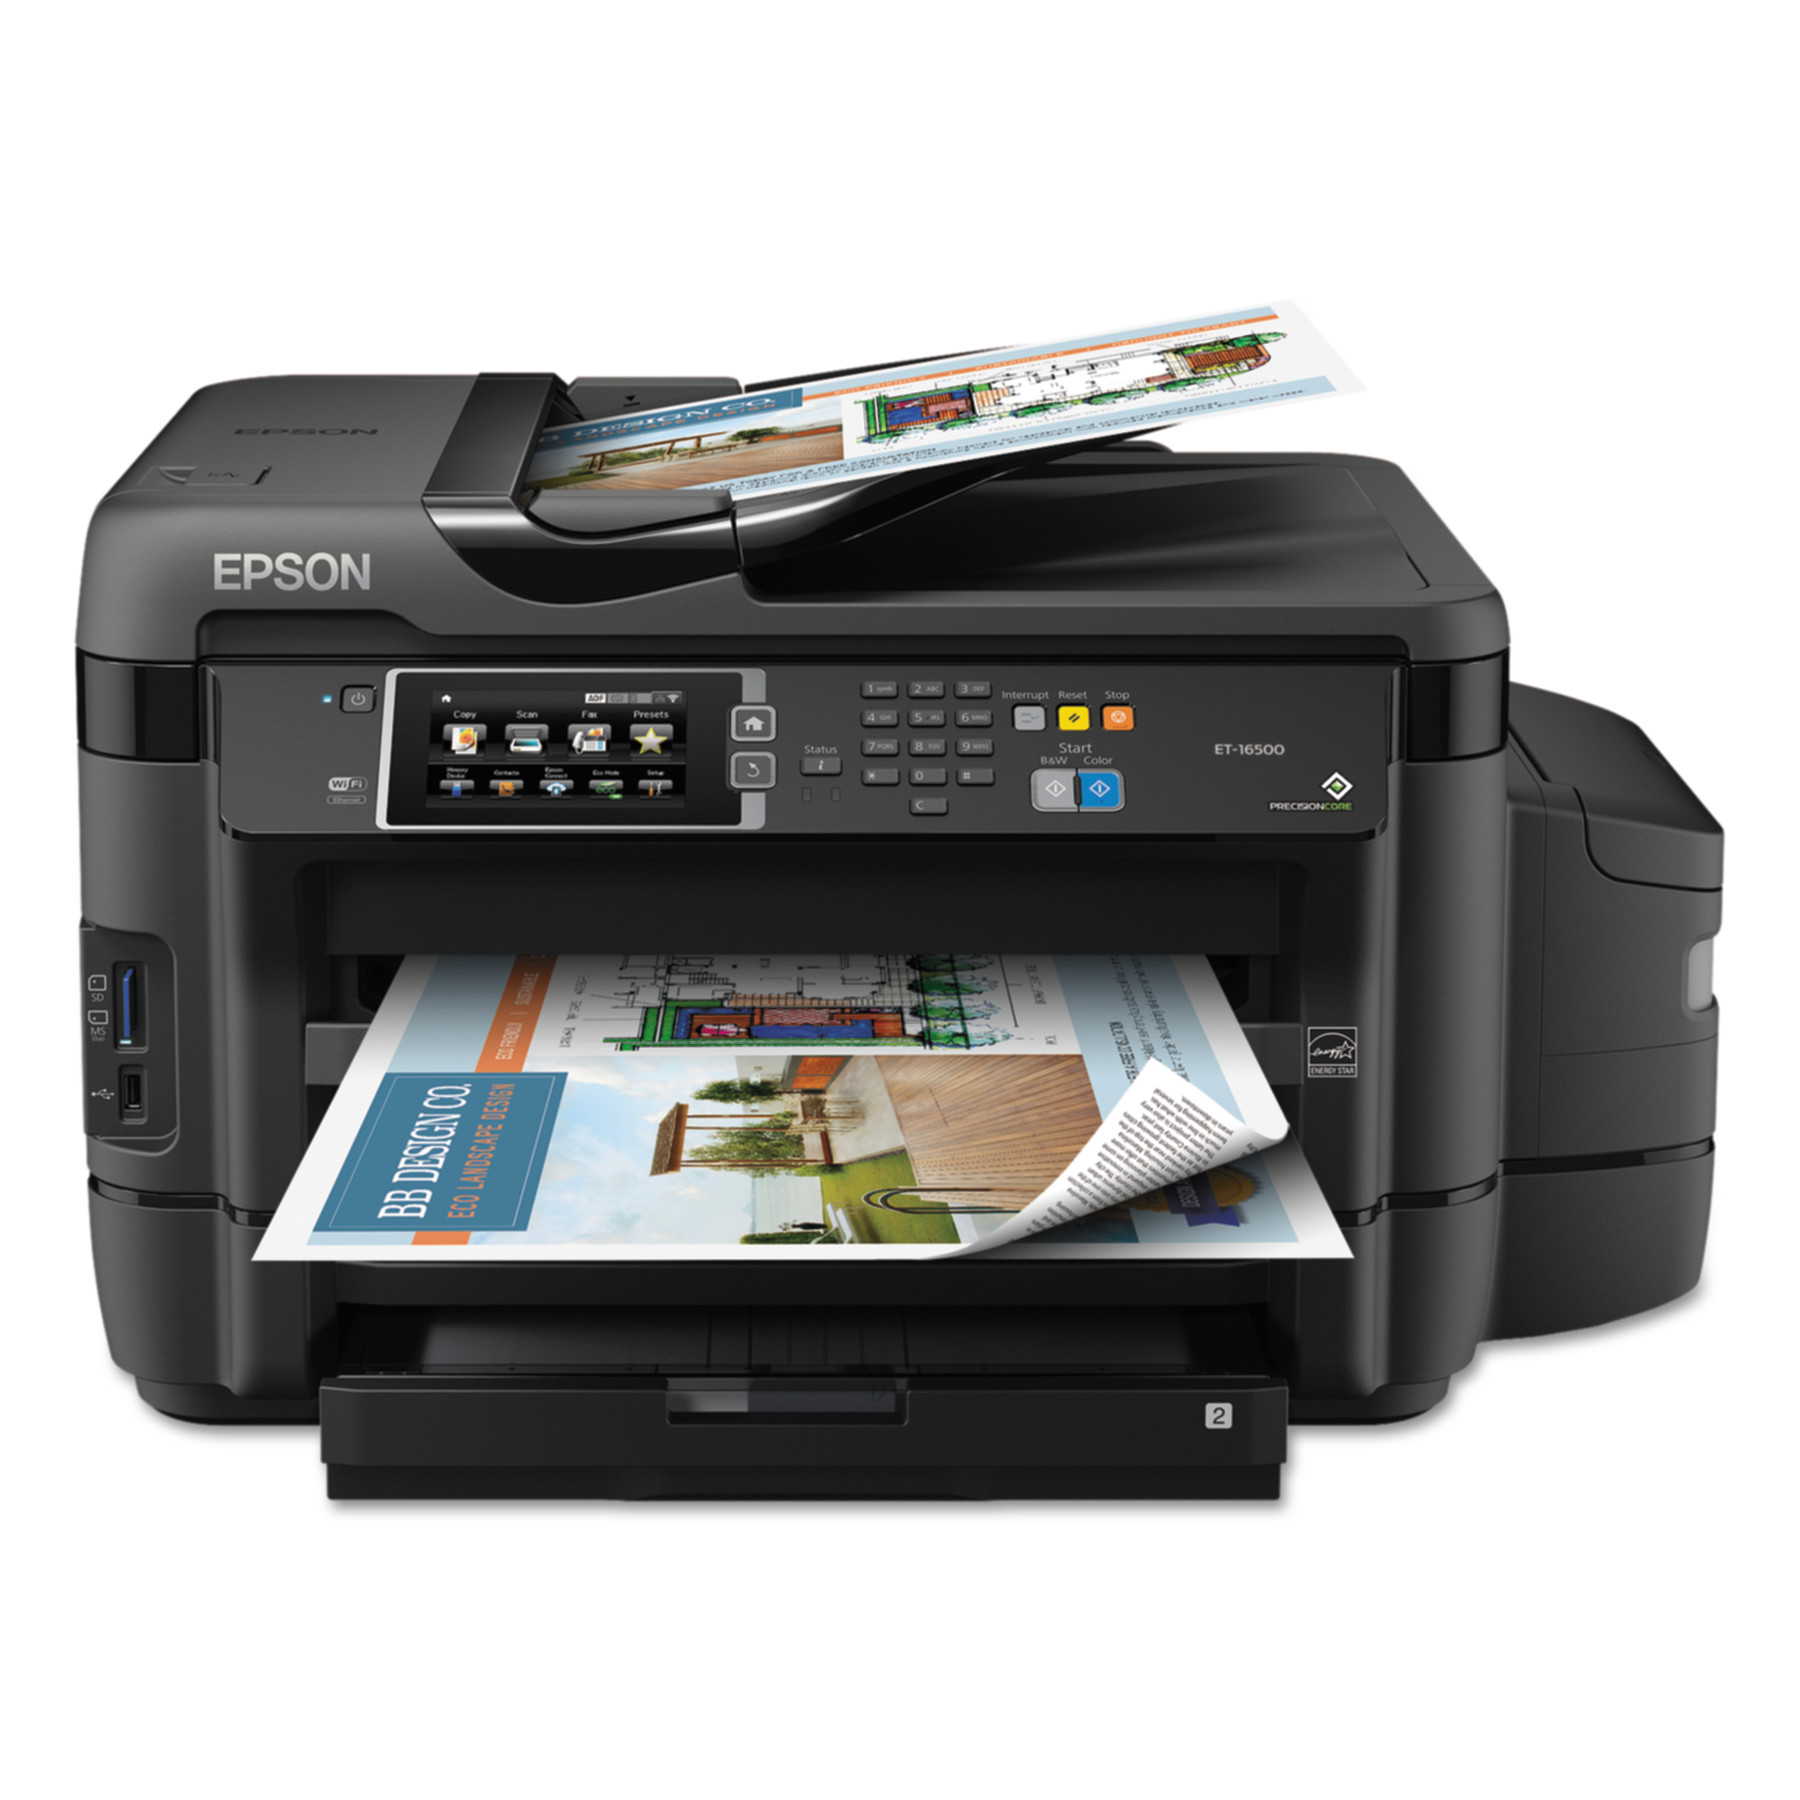 Epson WorkForce ET-16500 EcoTank Wide Format Wireless All-in-One Printer by Epson